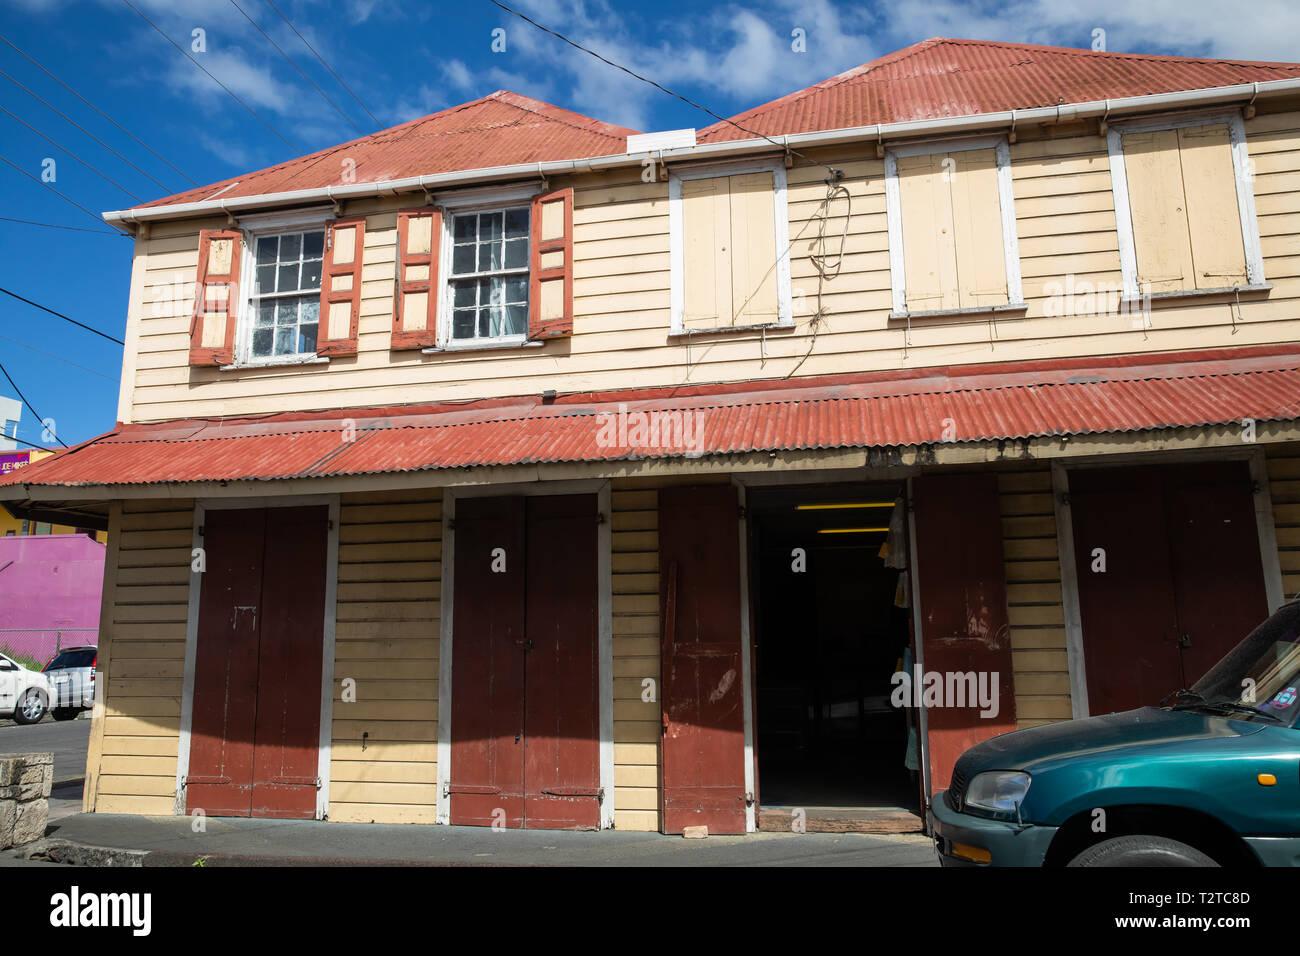 Colourful building in Saint John's, Capital of Antigua and Barbuda Stock Photo